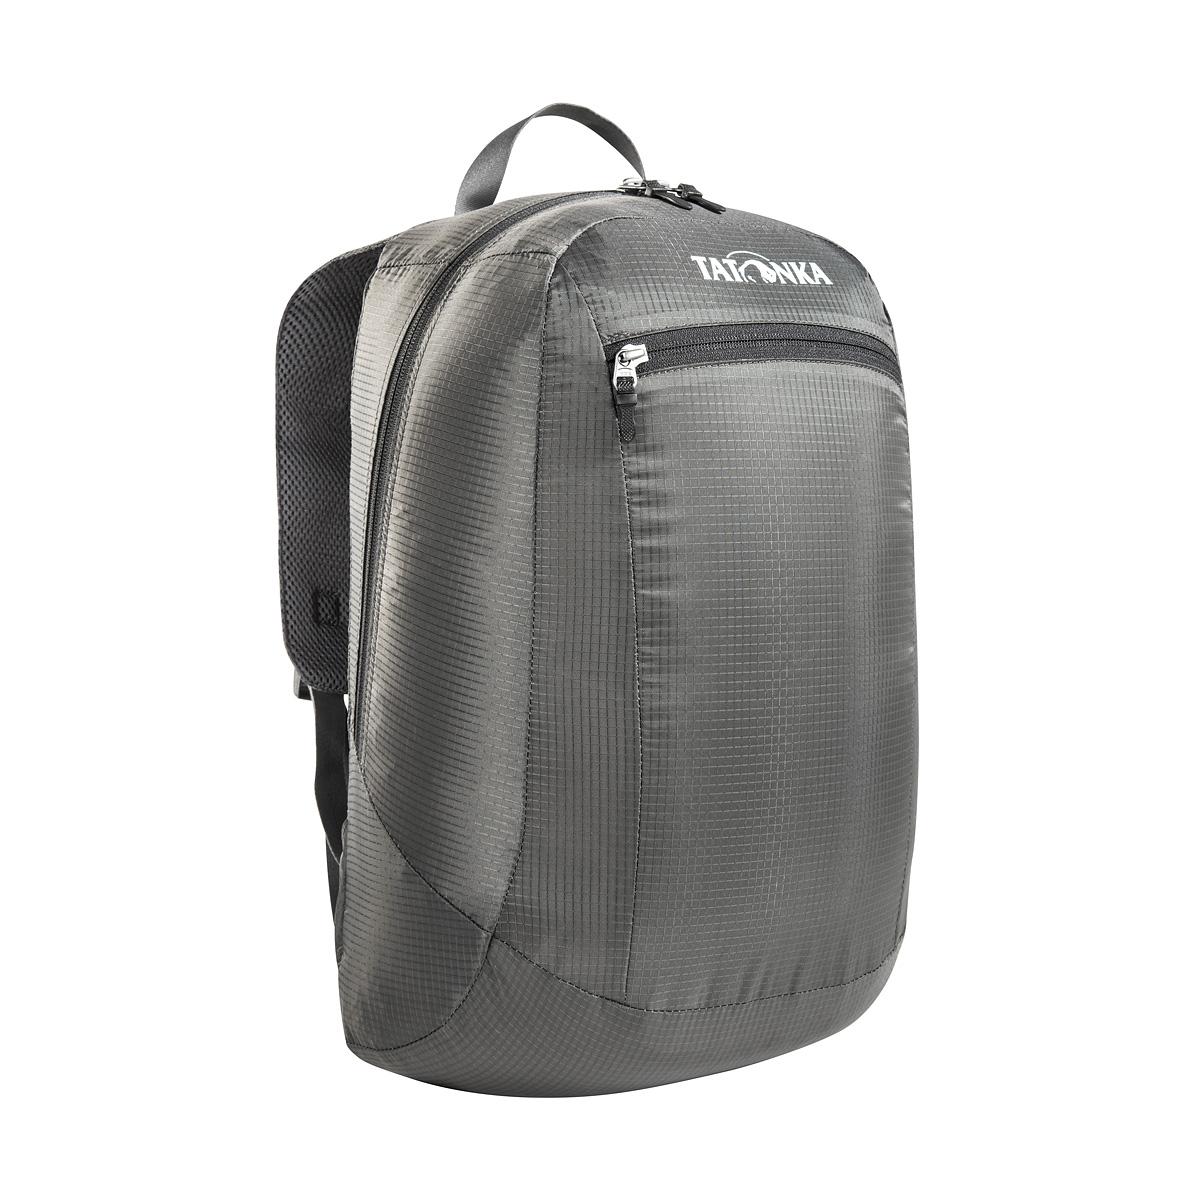 1a94de861b47 Рюкзак SQUEESY titan grey, 2200.021, Городские рюкзаки - арт. 1183180271